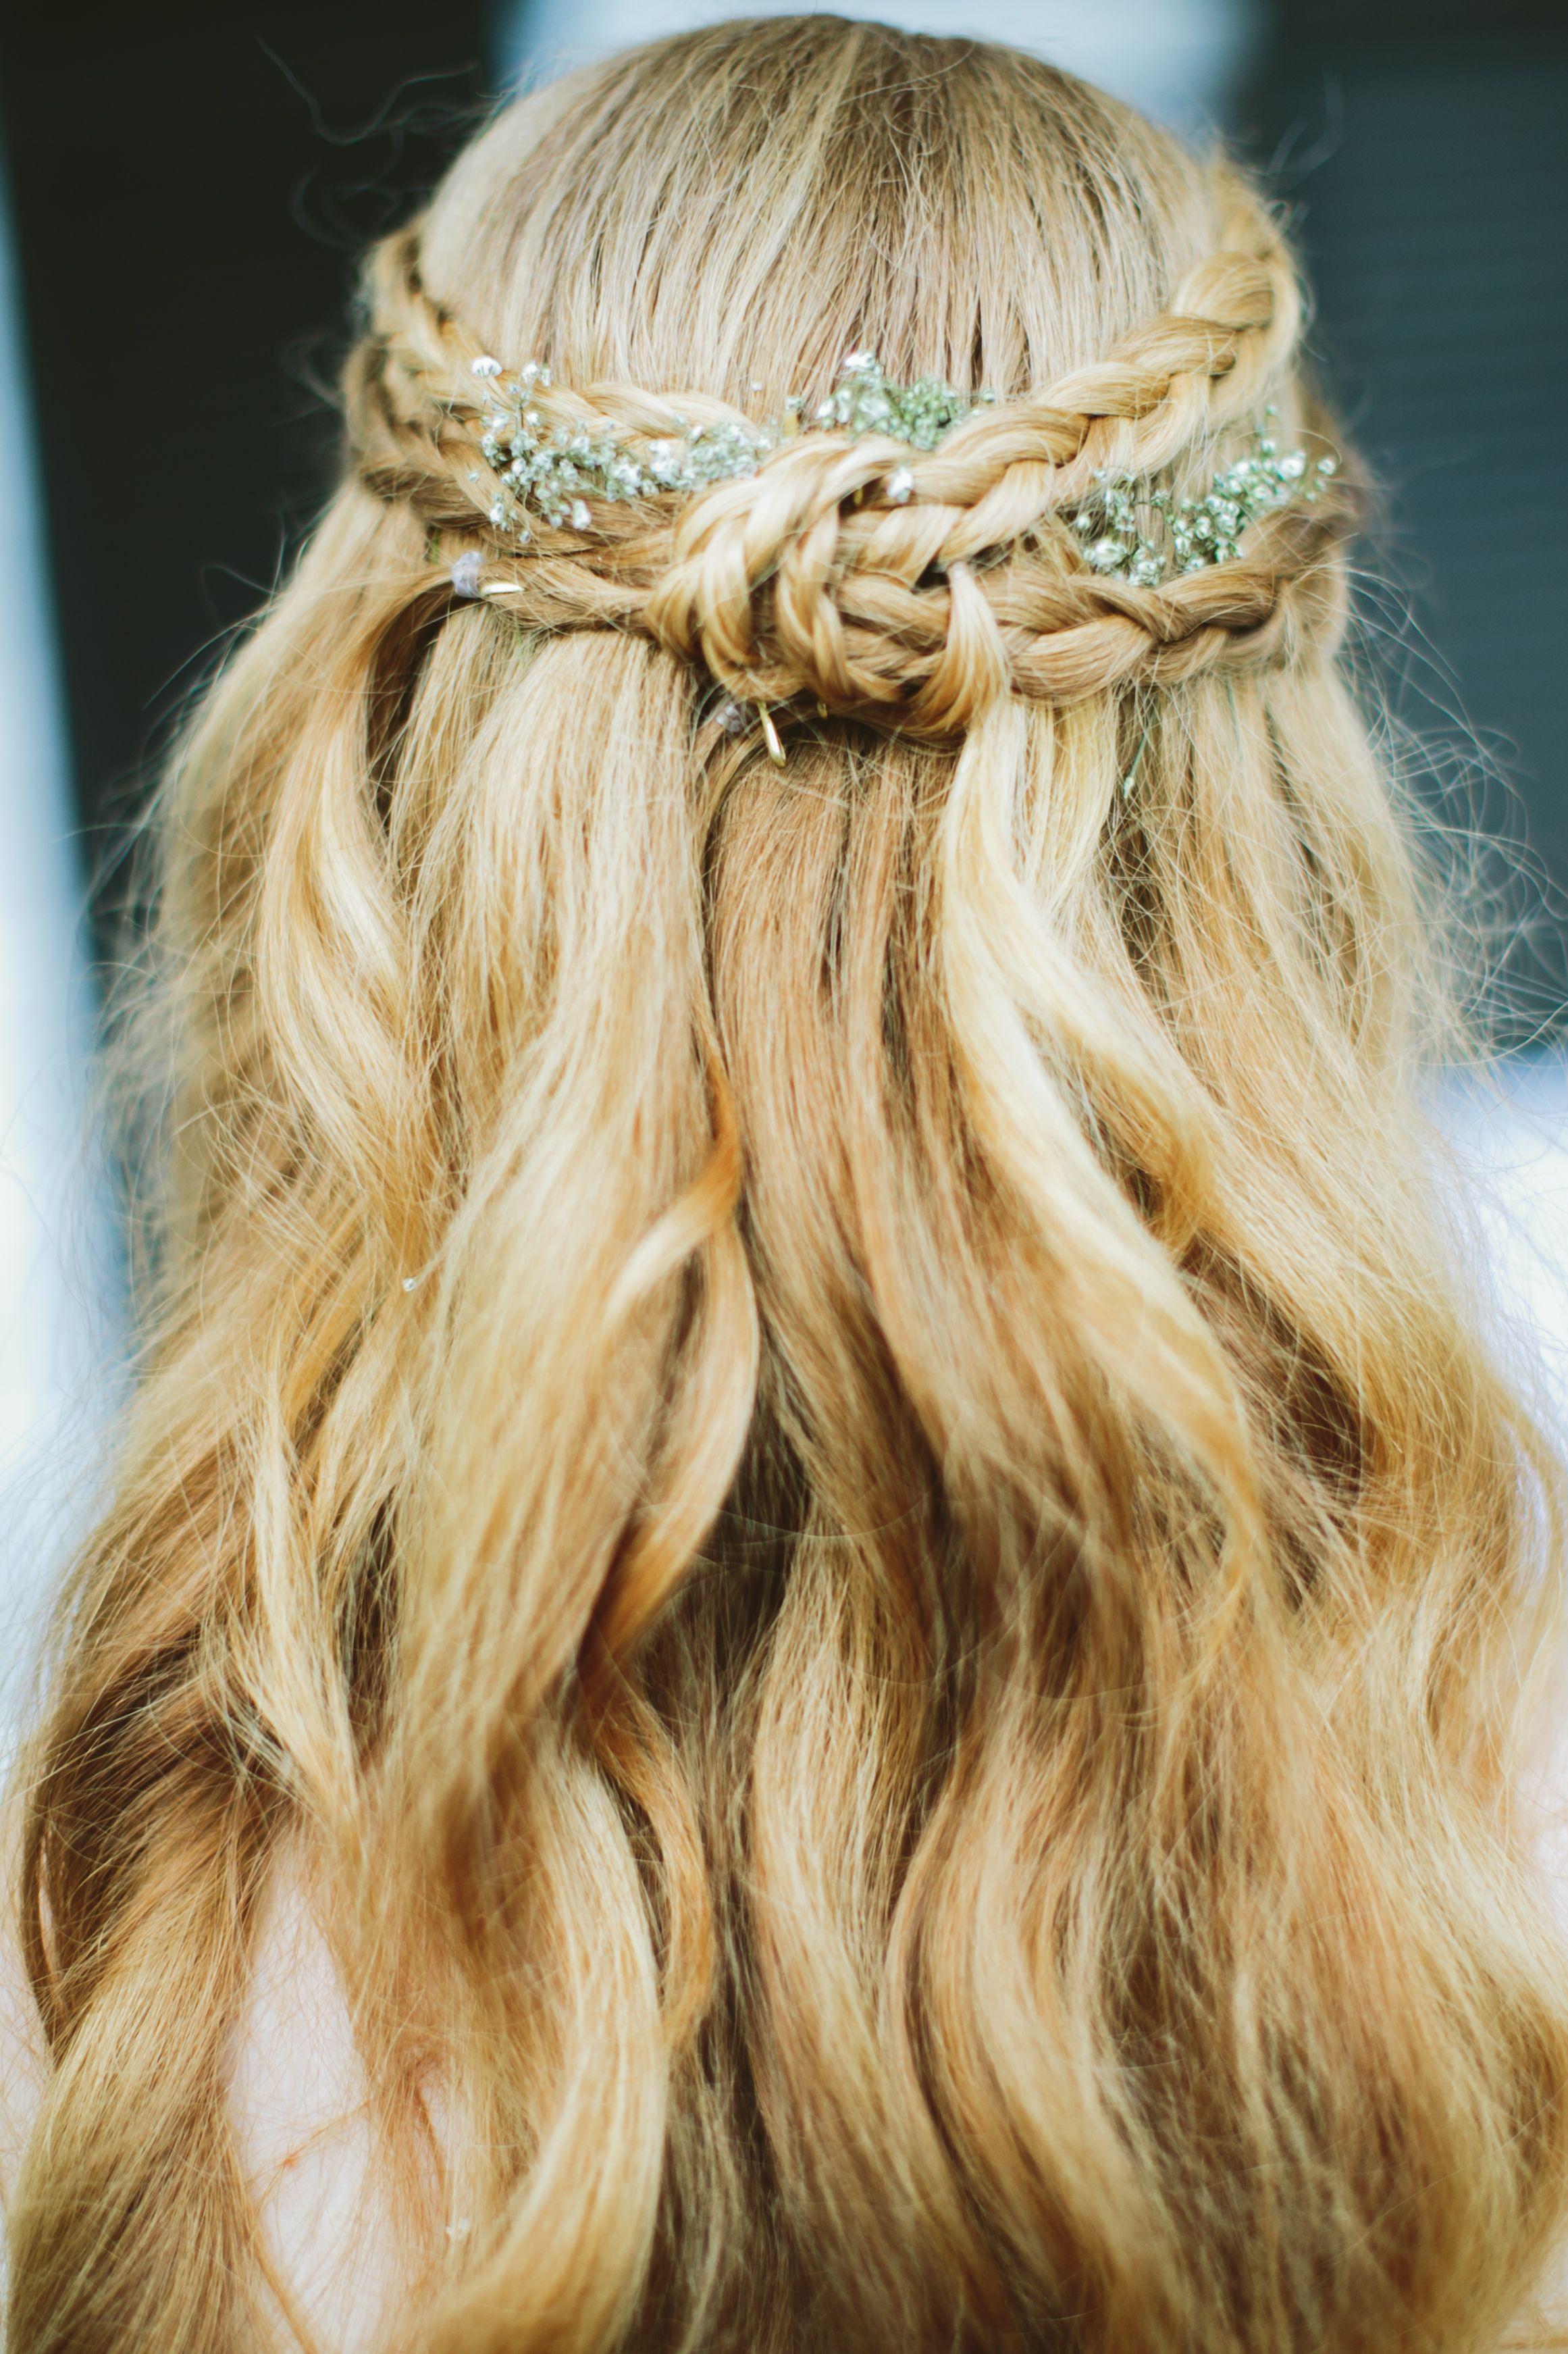 my wedding hair, styled by elizabeth littell. we kept it simple